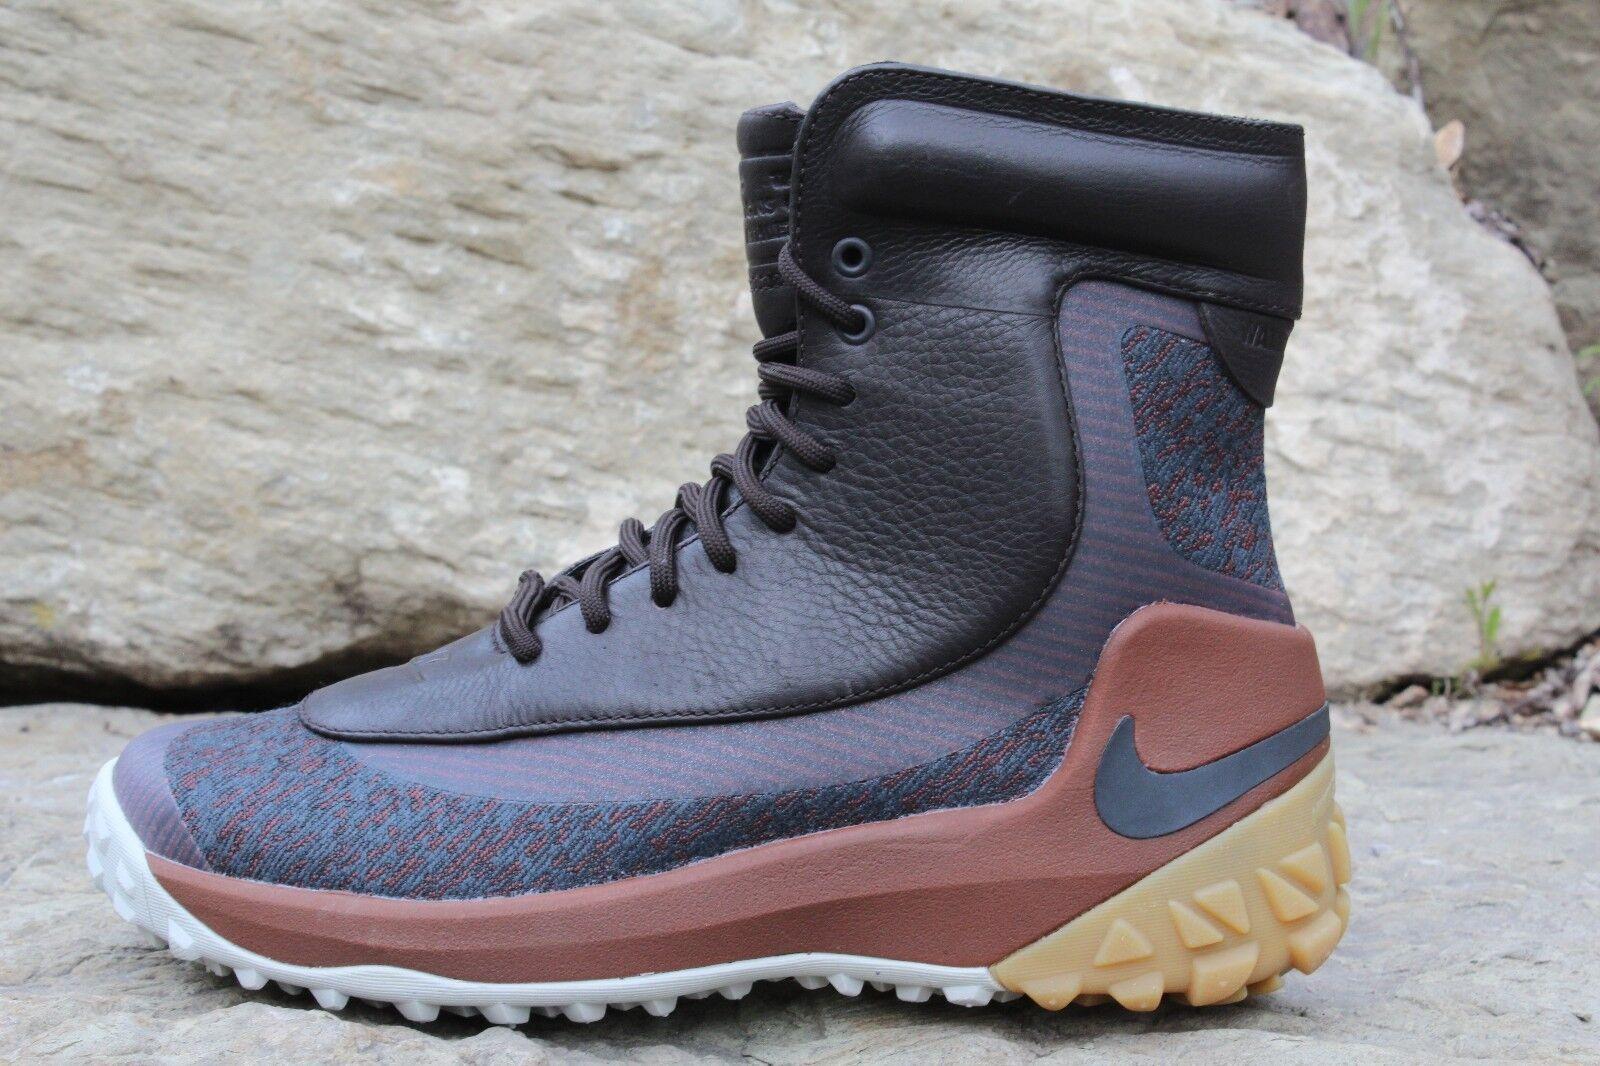 New Nike Zoom Kynsi JCRD Women's Boots Comfortable Brand discount